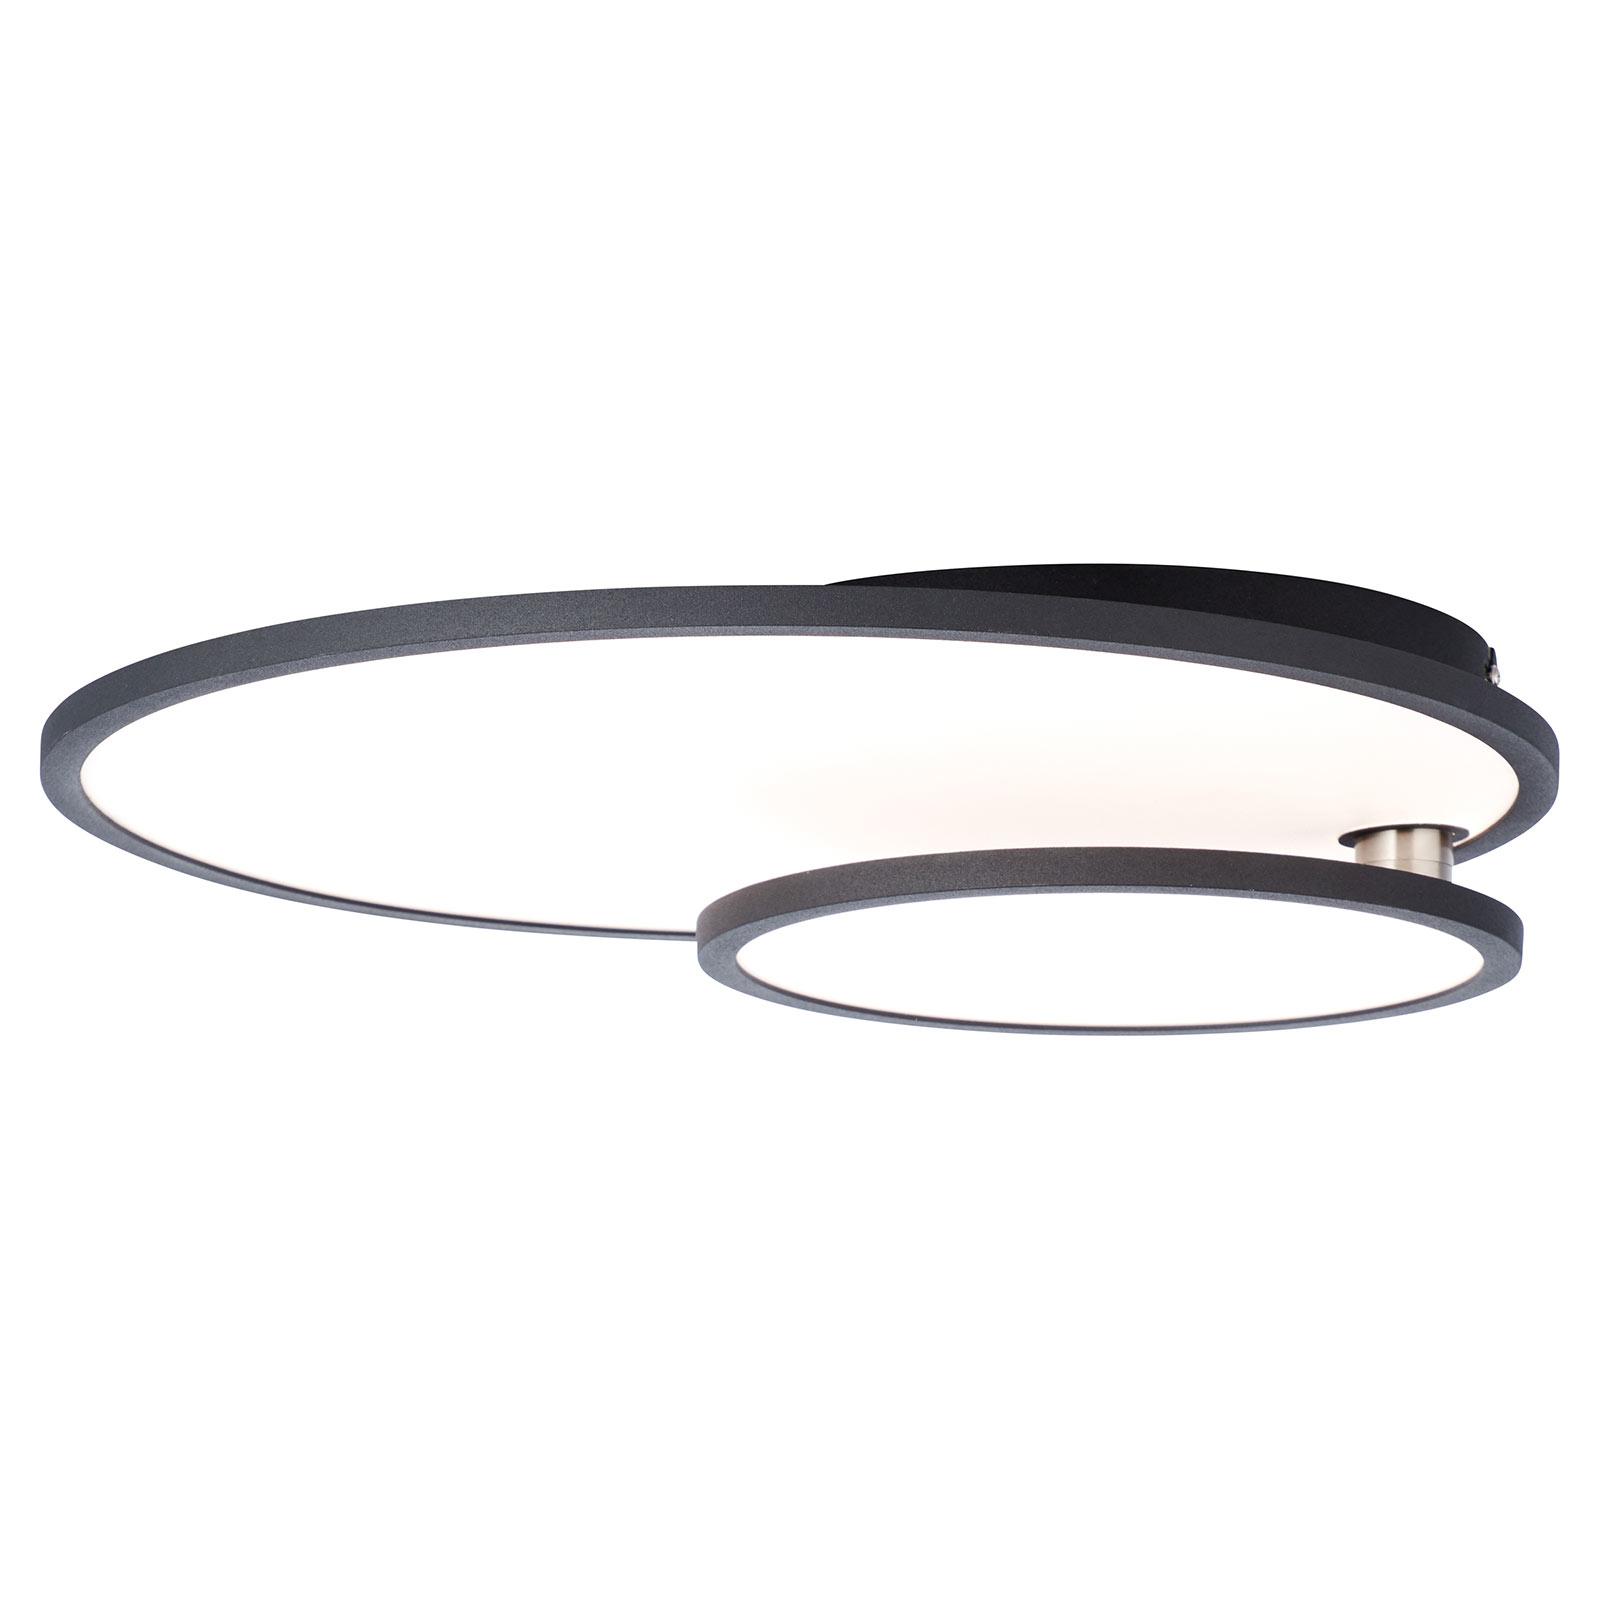 LED-taklampe Bility, rund, svart ramme